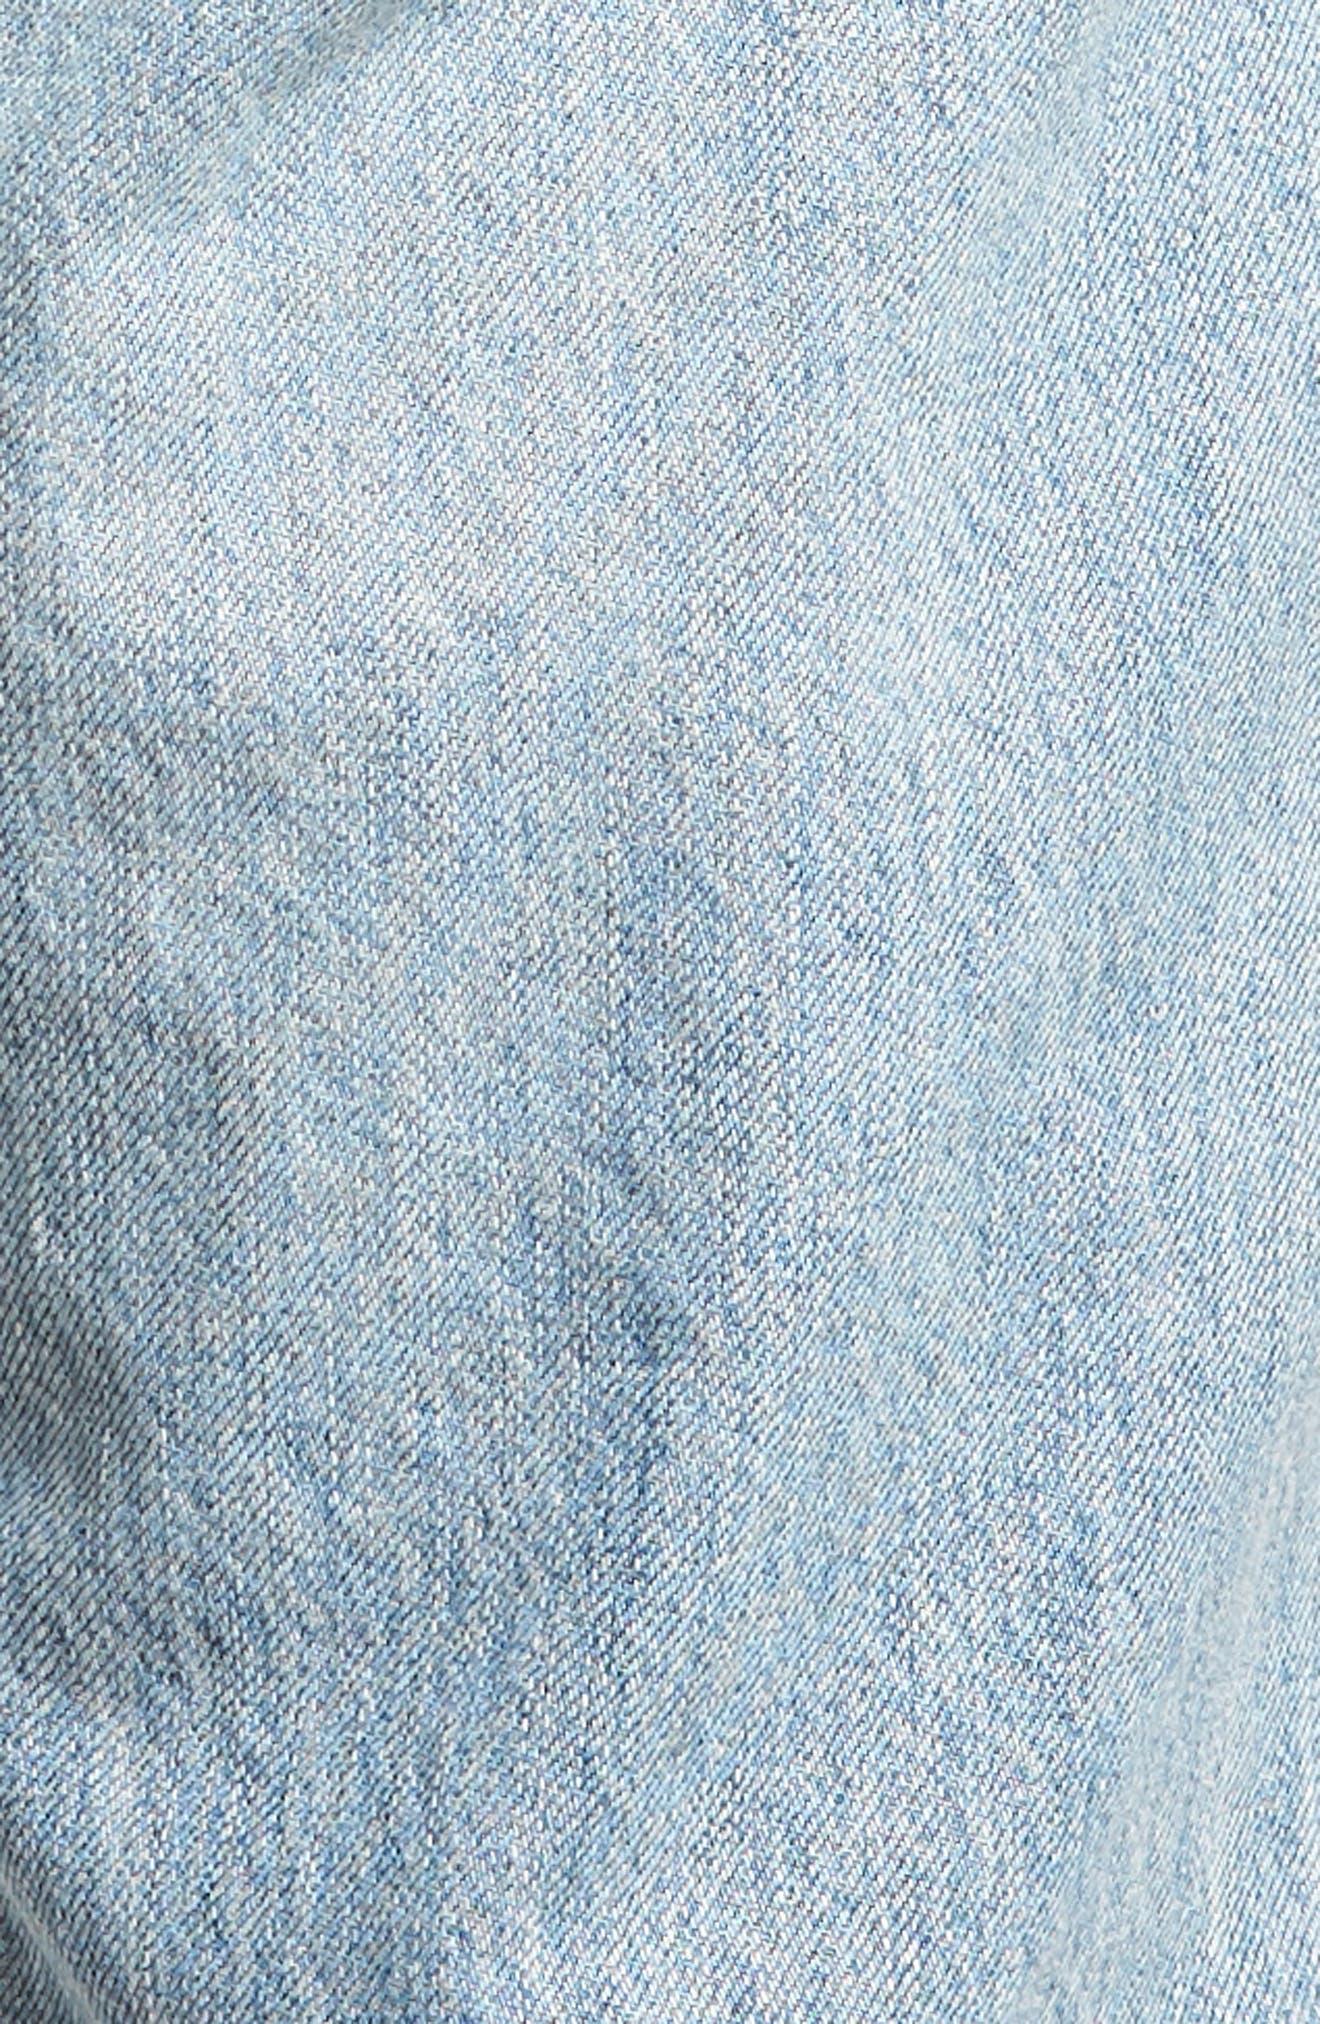 Tellis Slim Fit Jeans,                             Alternate thumbnail 4, color,                             494